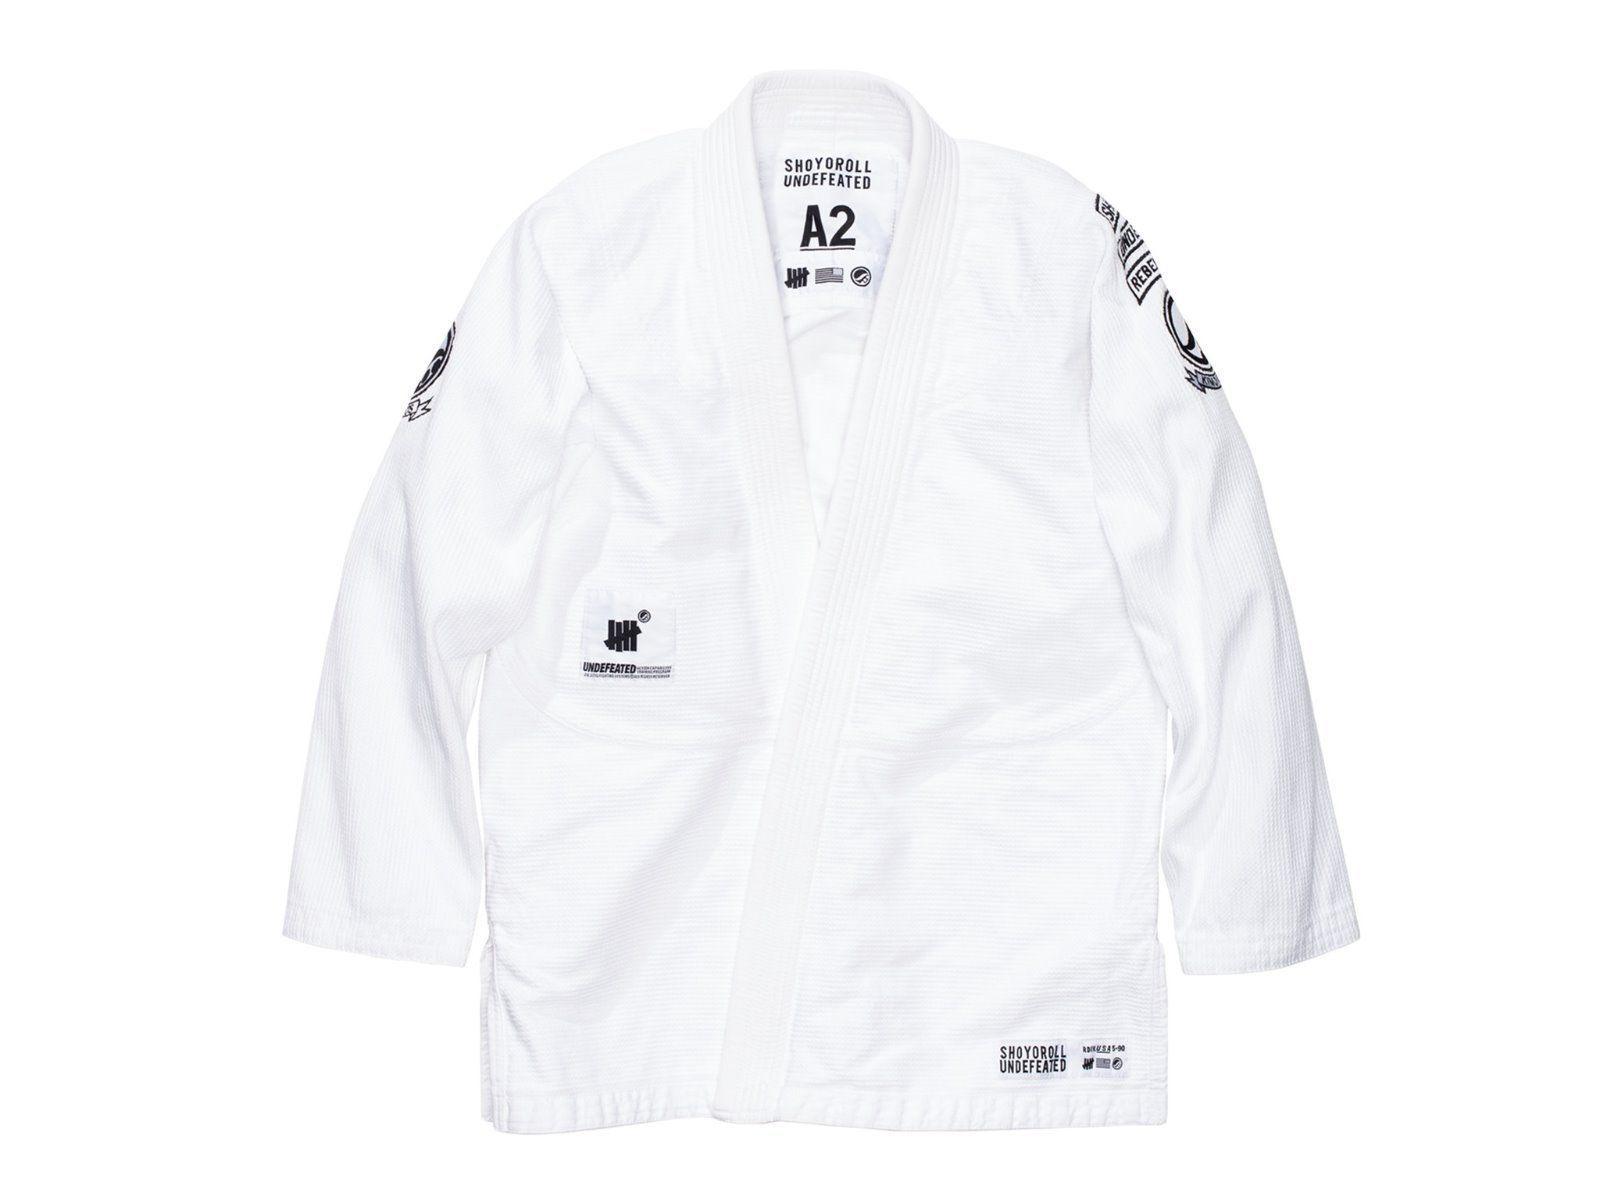 Shoygoldll White A2 Batch UND Kimono UNDEFETED